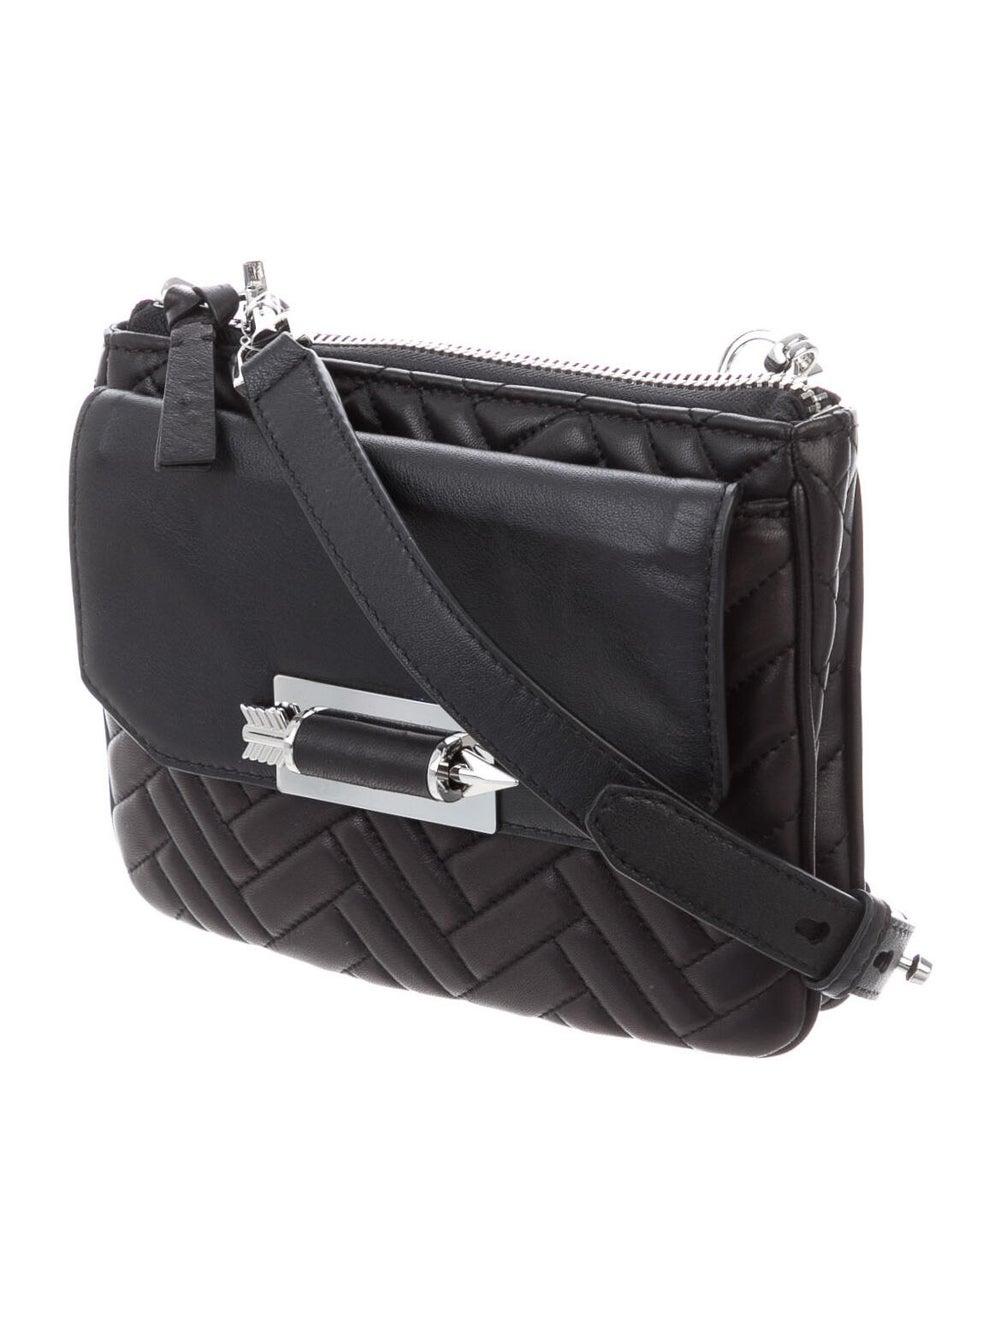 Mackage Leather Crossbody Bag Black - image 3